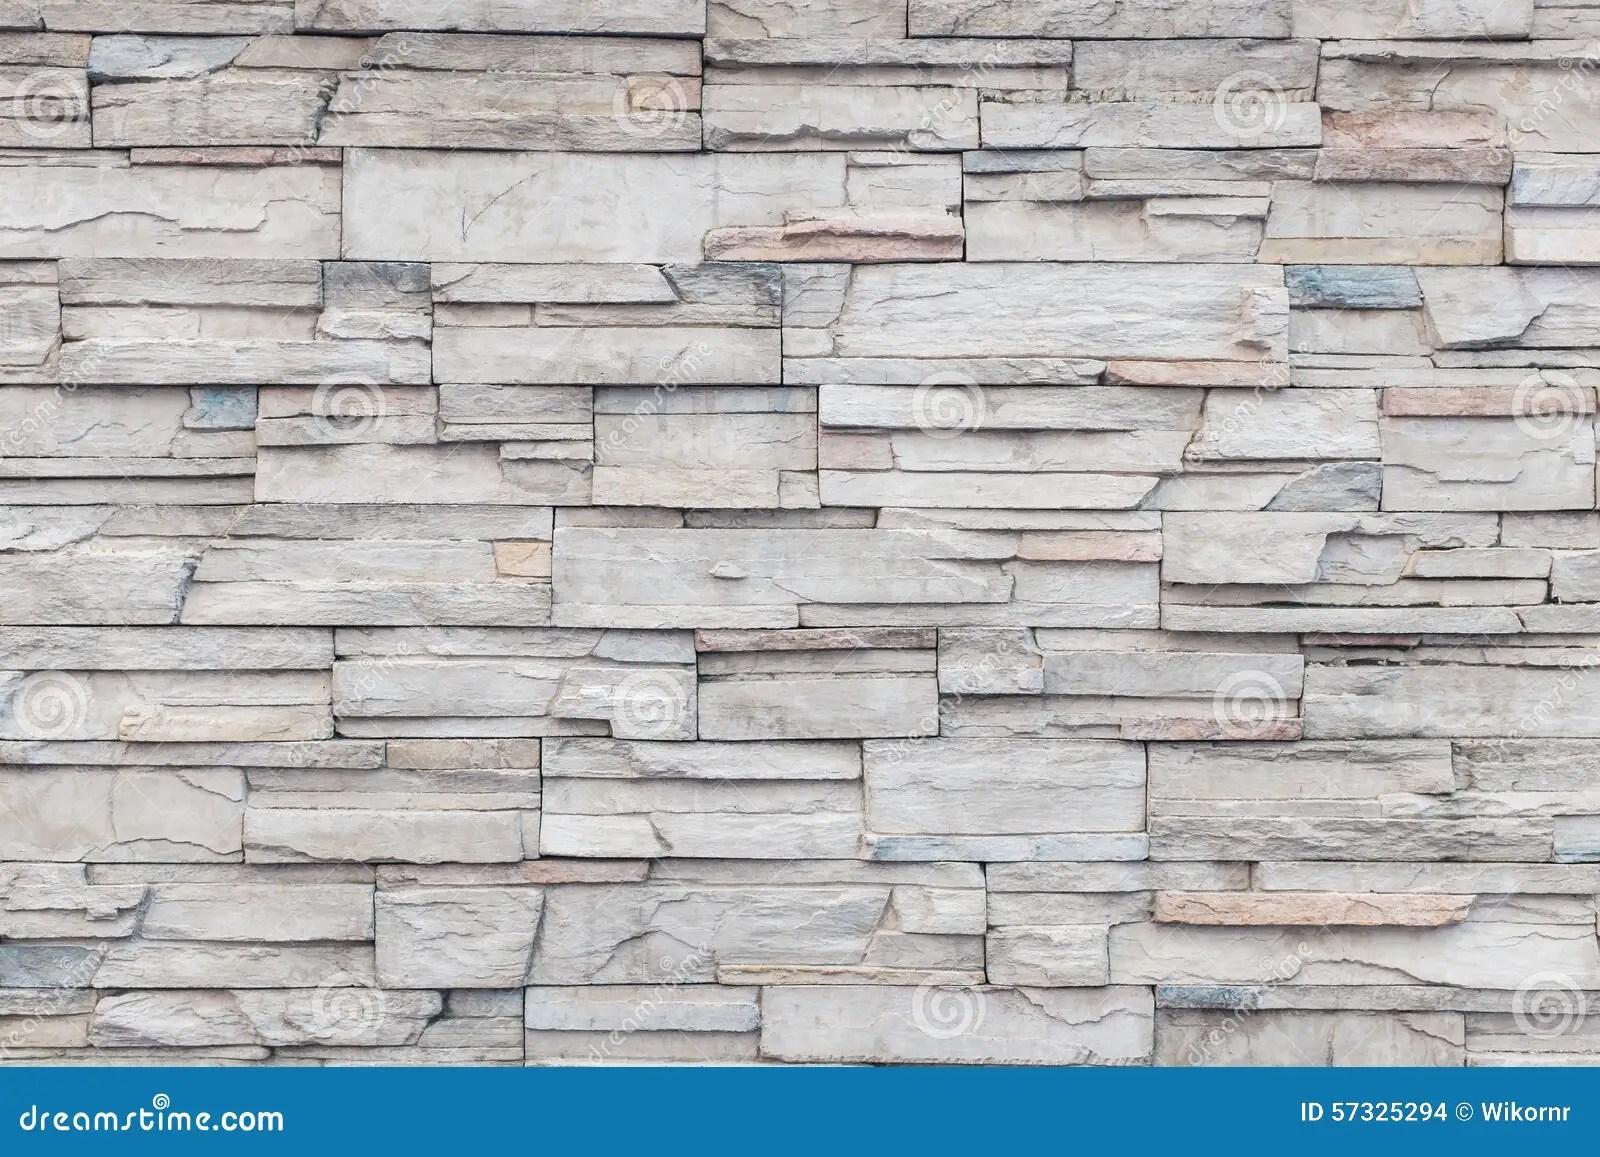 Modern 3d Brick Pattern Wallpaper Marble Brick Wall Texture Stock Photo Image 57325294